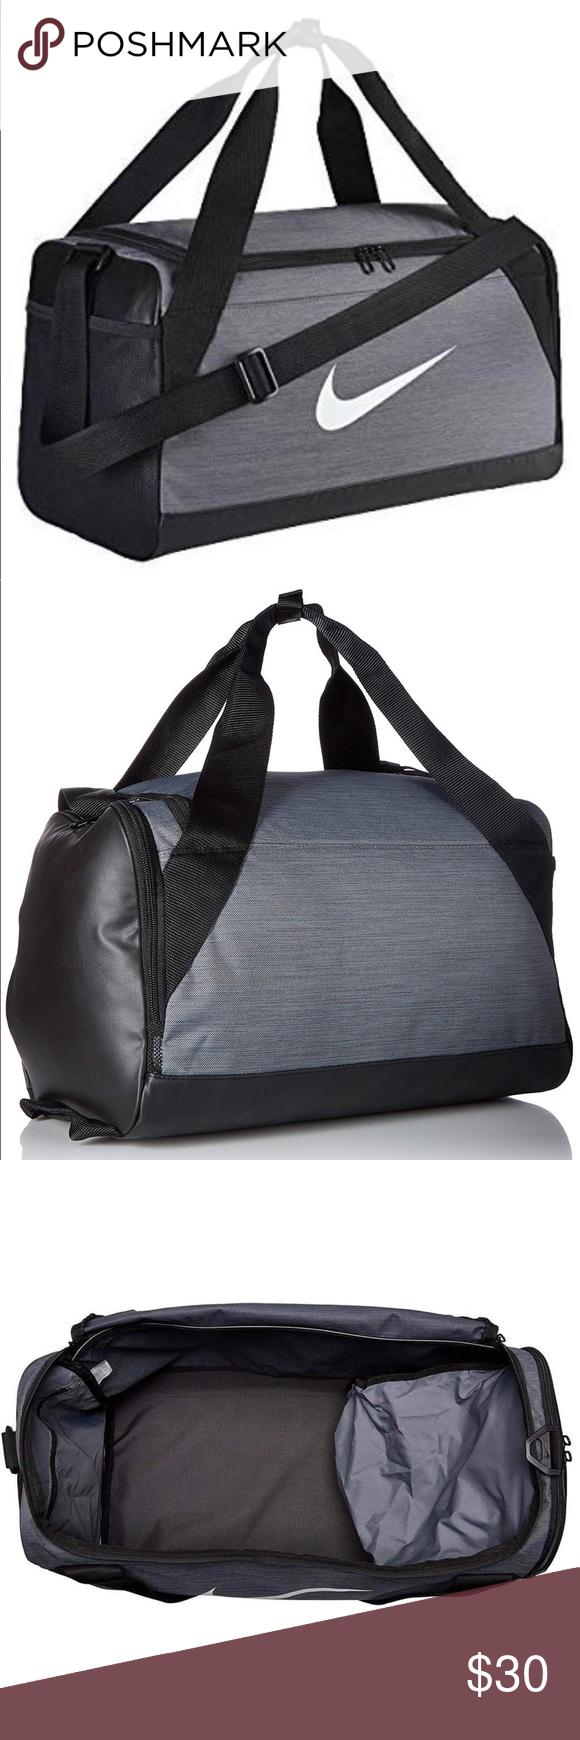 6a7fa7439 Nike Brasilia 8 Small Duffel Bag - Grey Nike Brasilia 8 Duffle Bag Model:  BA5335